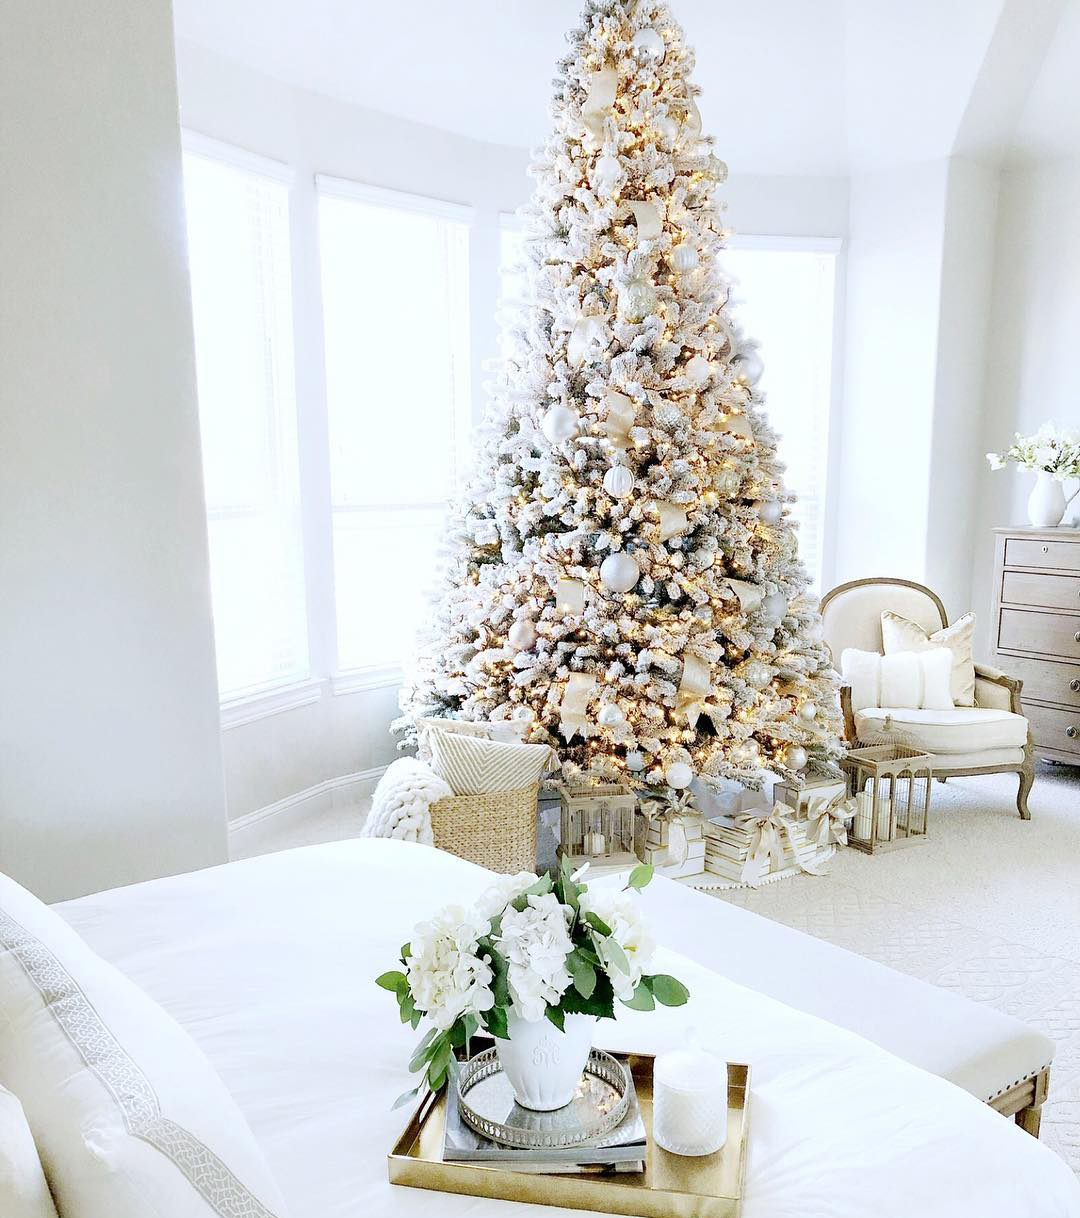 White Christmas Tree | My Texas House Blog